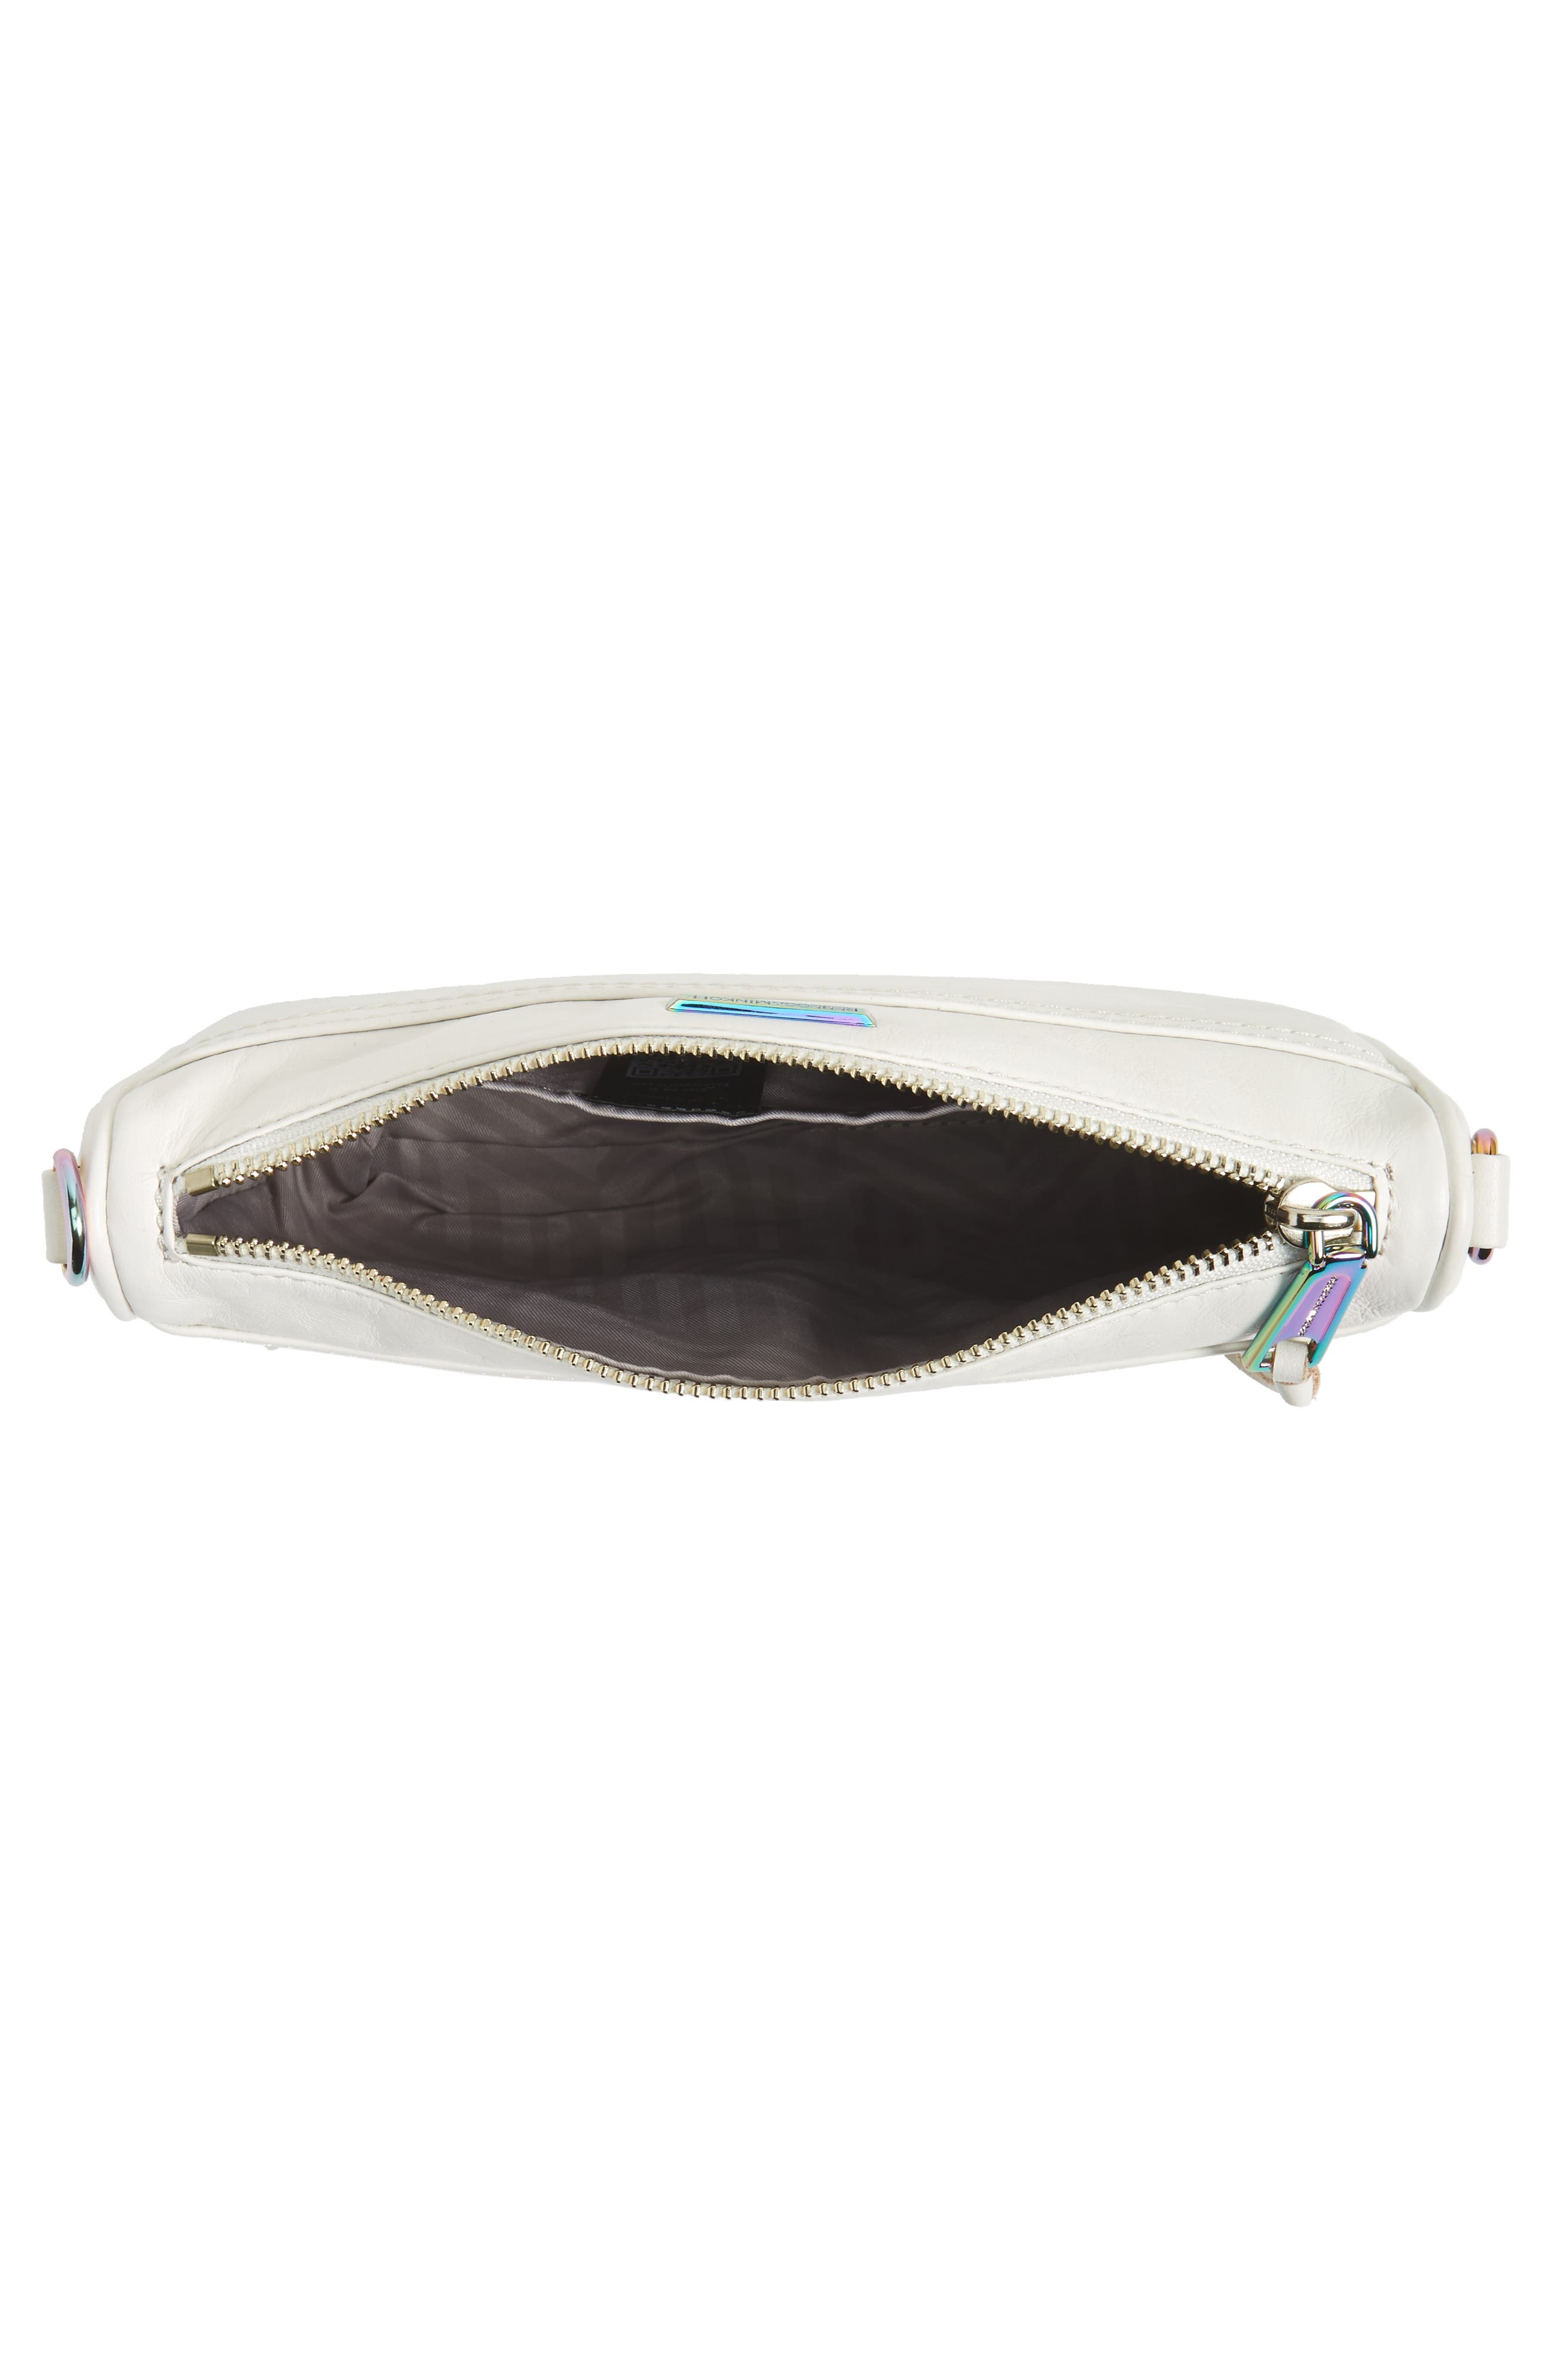 Mini MAC Convertible Crossbody Bag,                             Alternate thumbnail 5, color,                             Bianco